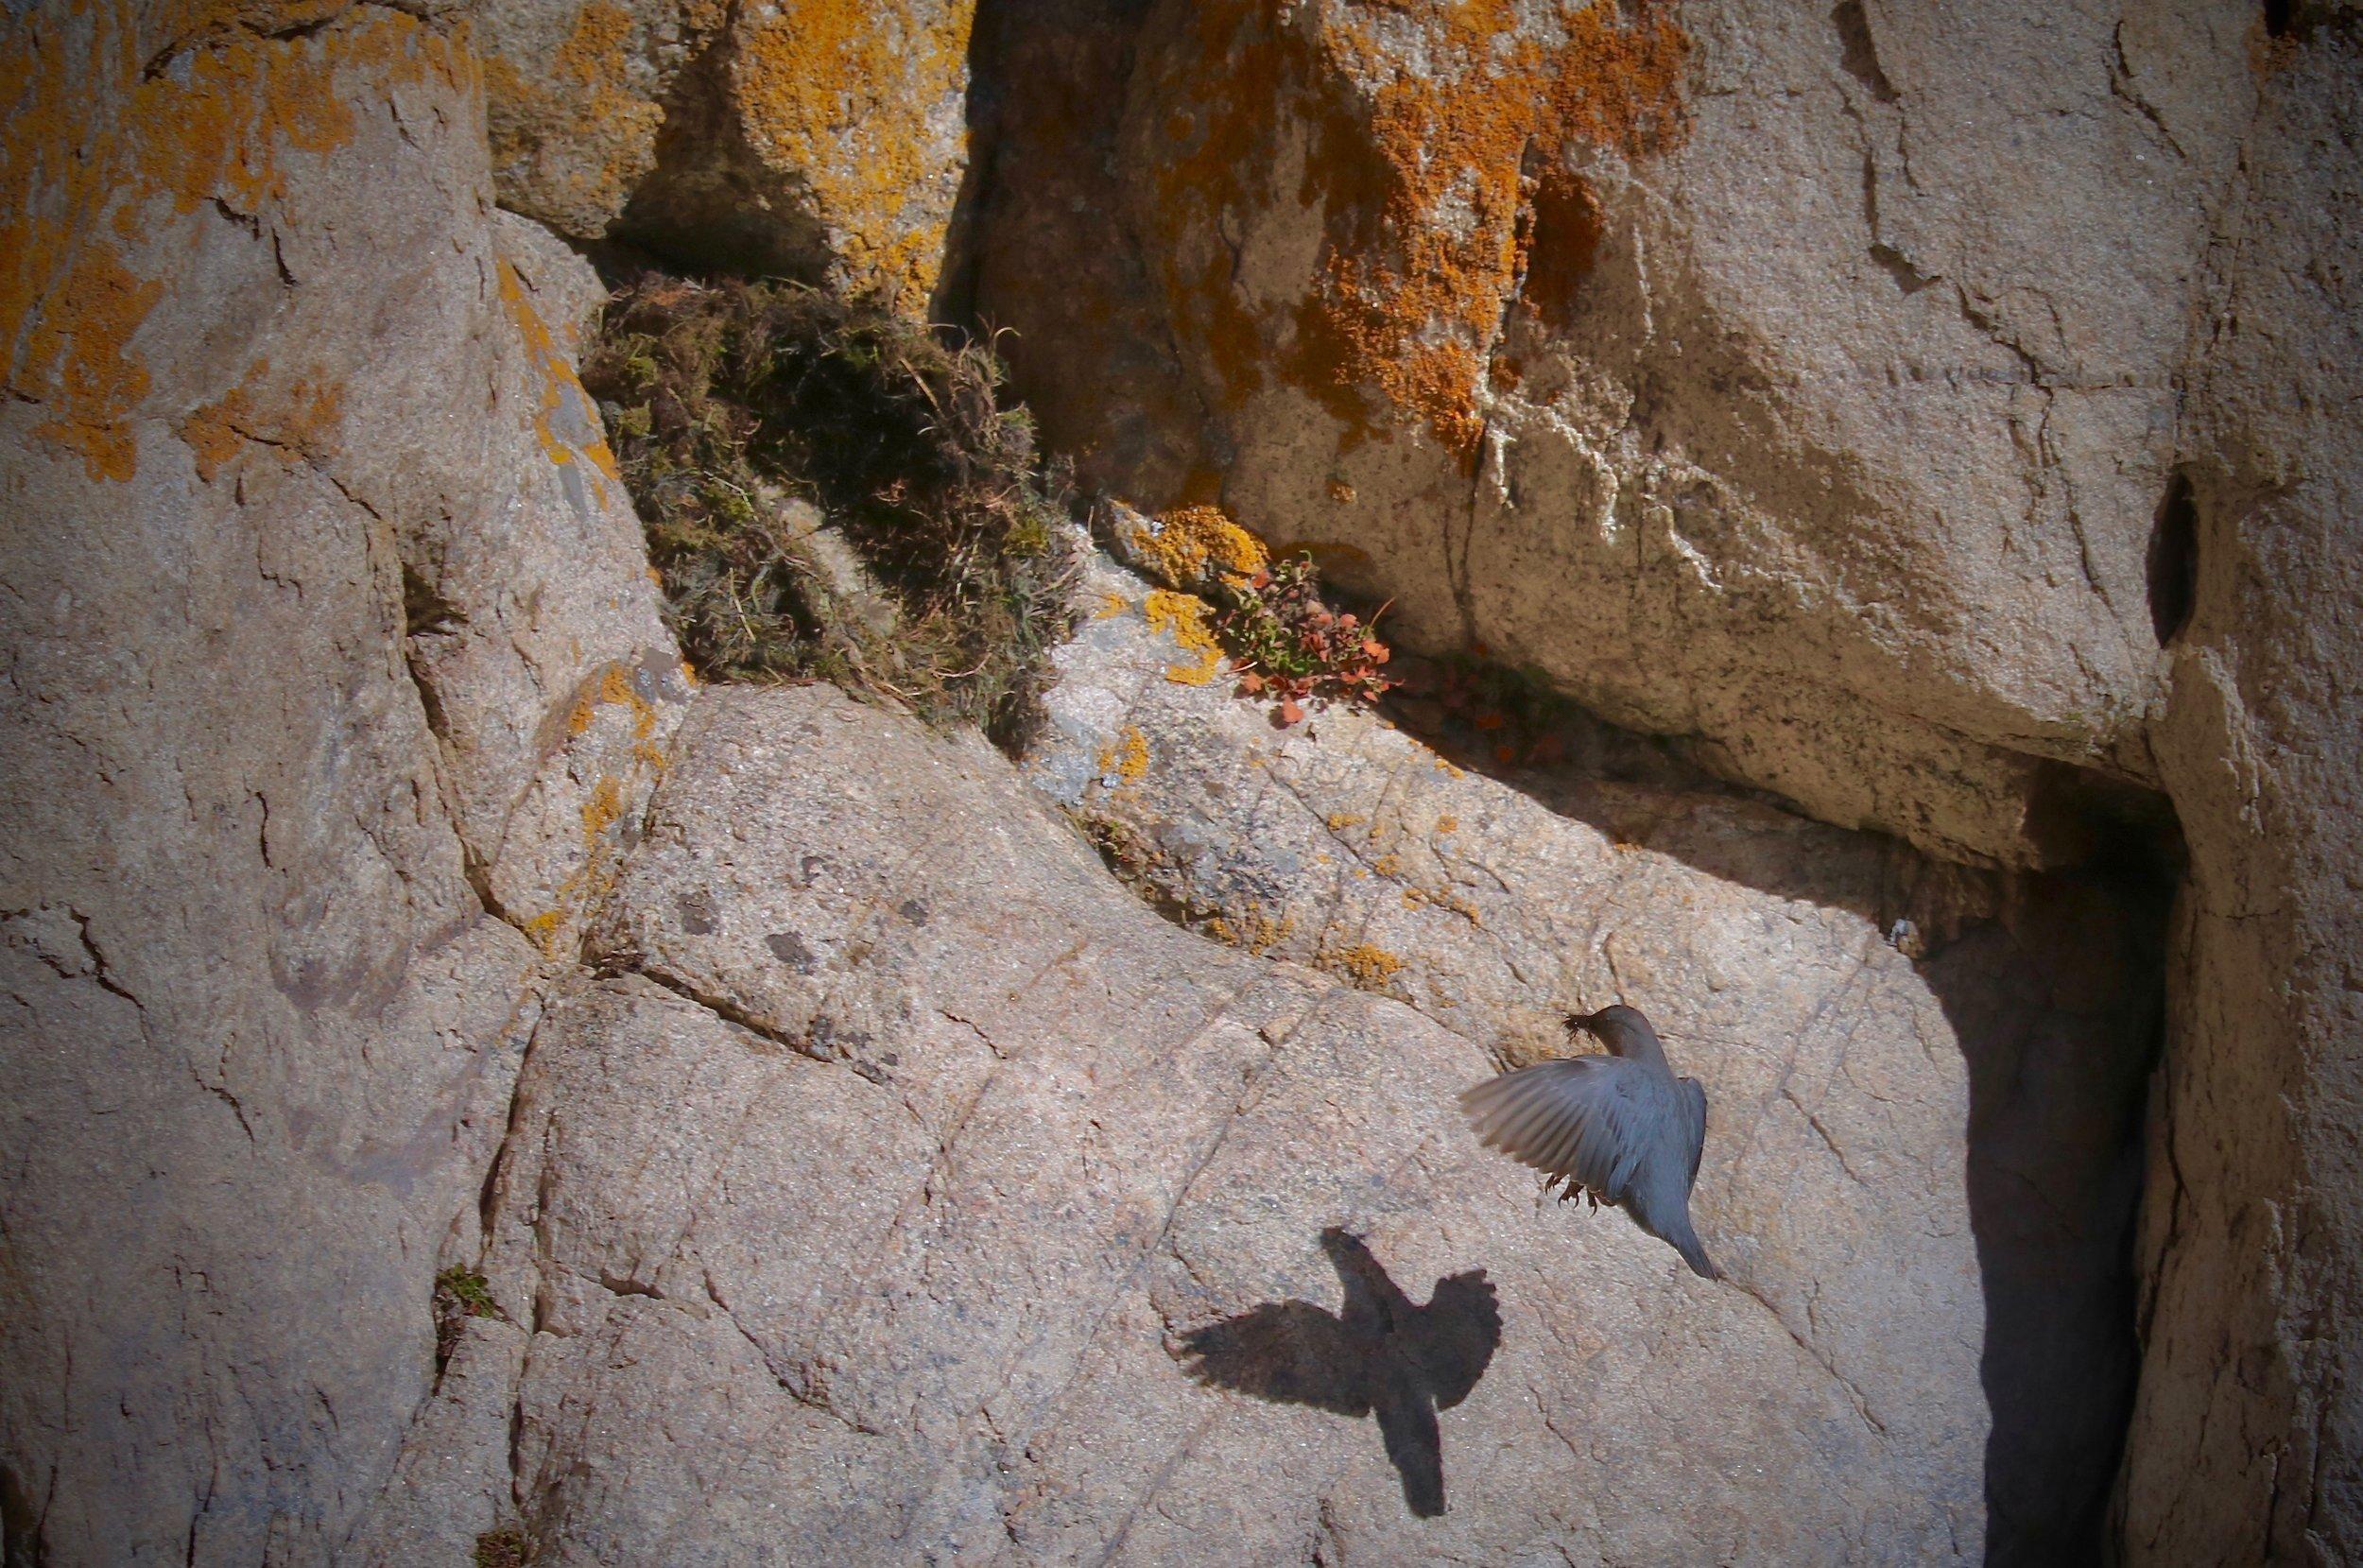 American Dipper, nest-building, South Platte River, Elevenmile Canyon, Colorado, USA